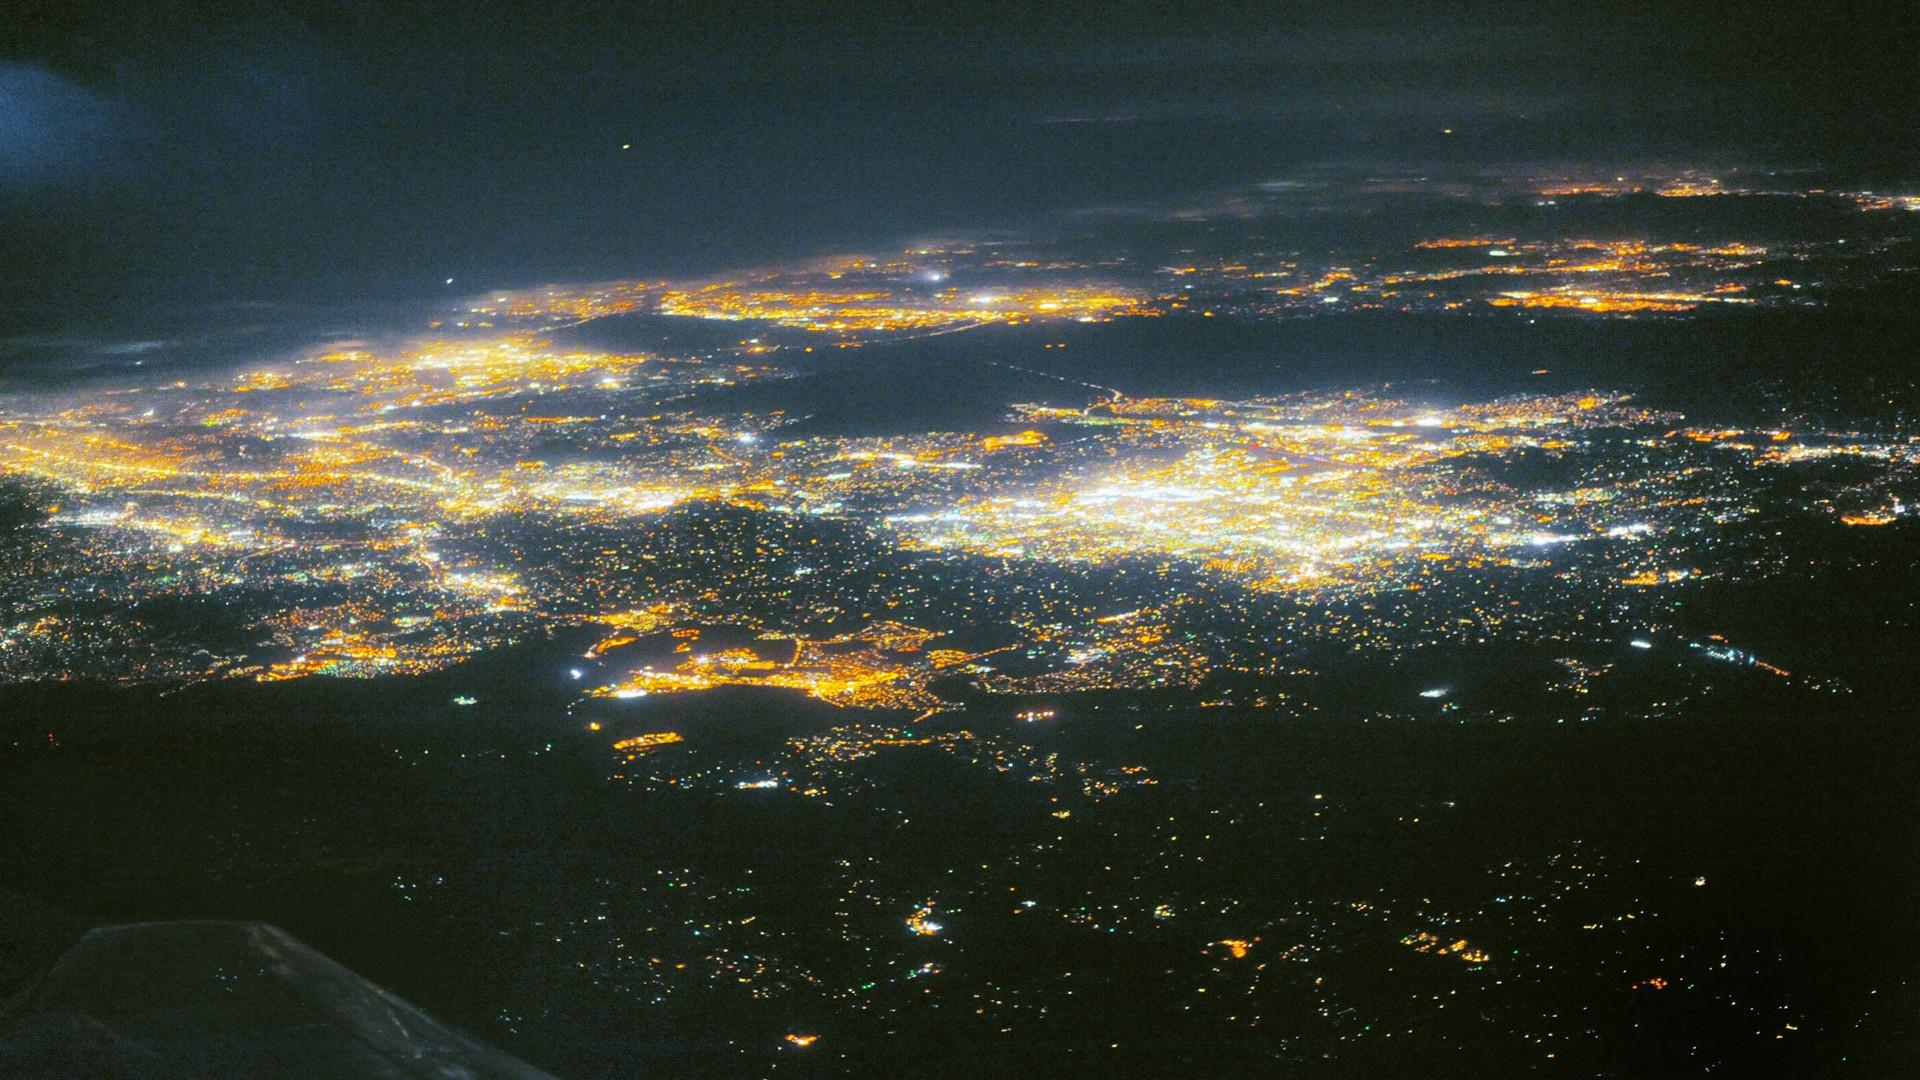 City Aerial View City Lights Night 1920x1080